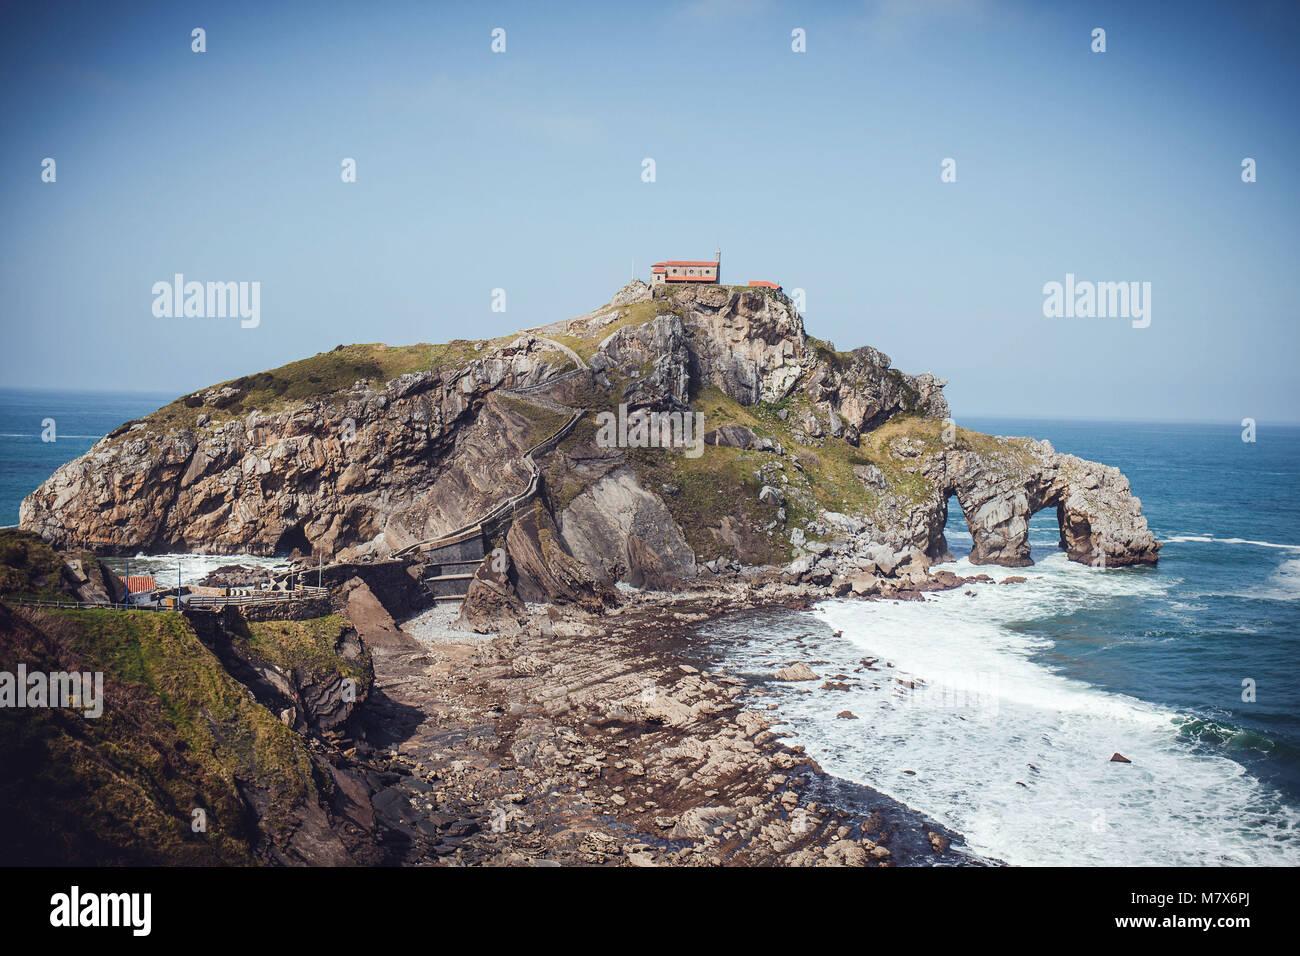 Spain, Bermeo, Biscay, Spanish Basque Country: Hermitage of San Juan de Gaztelugatxe - Stock Image